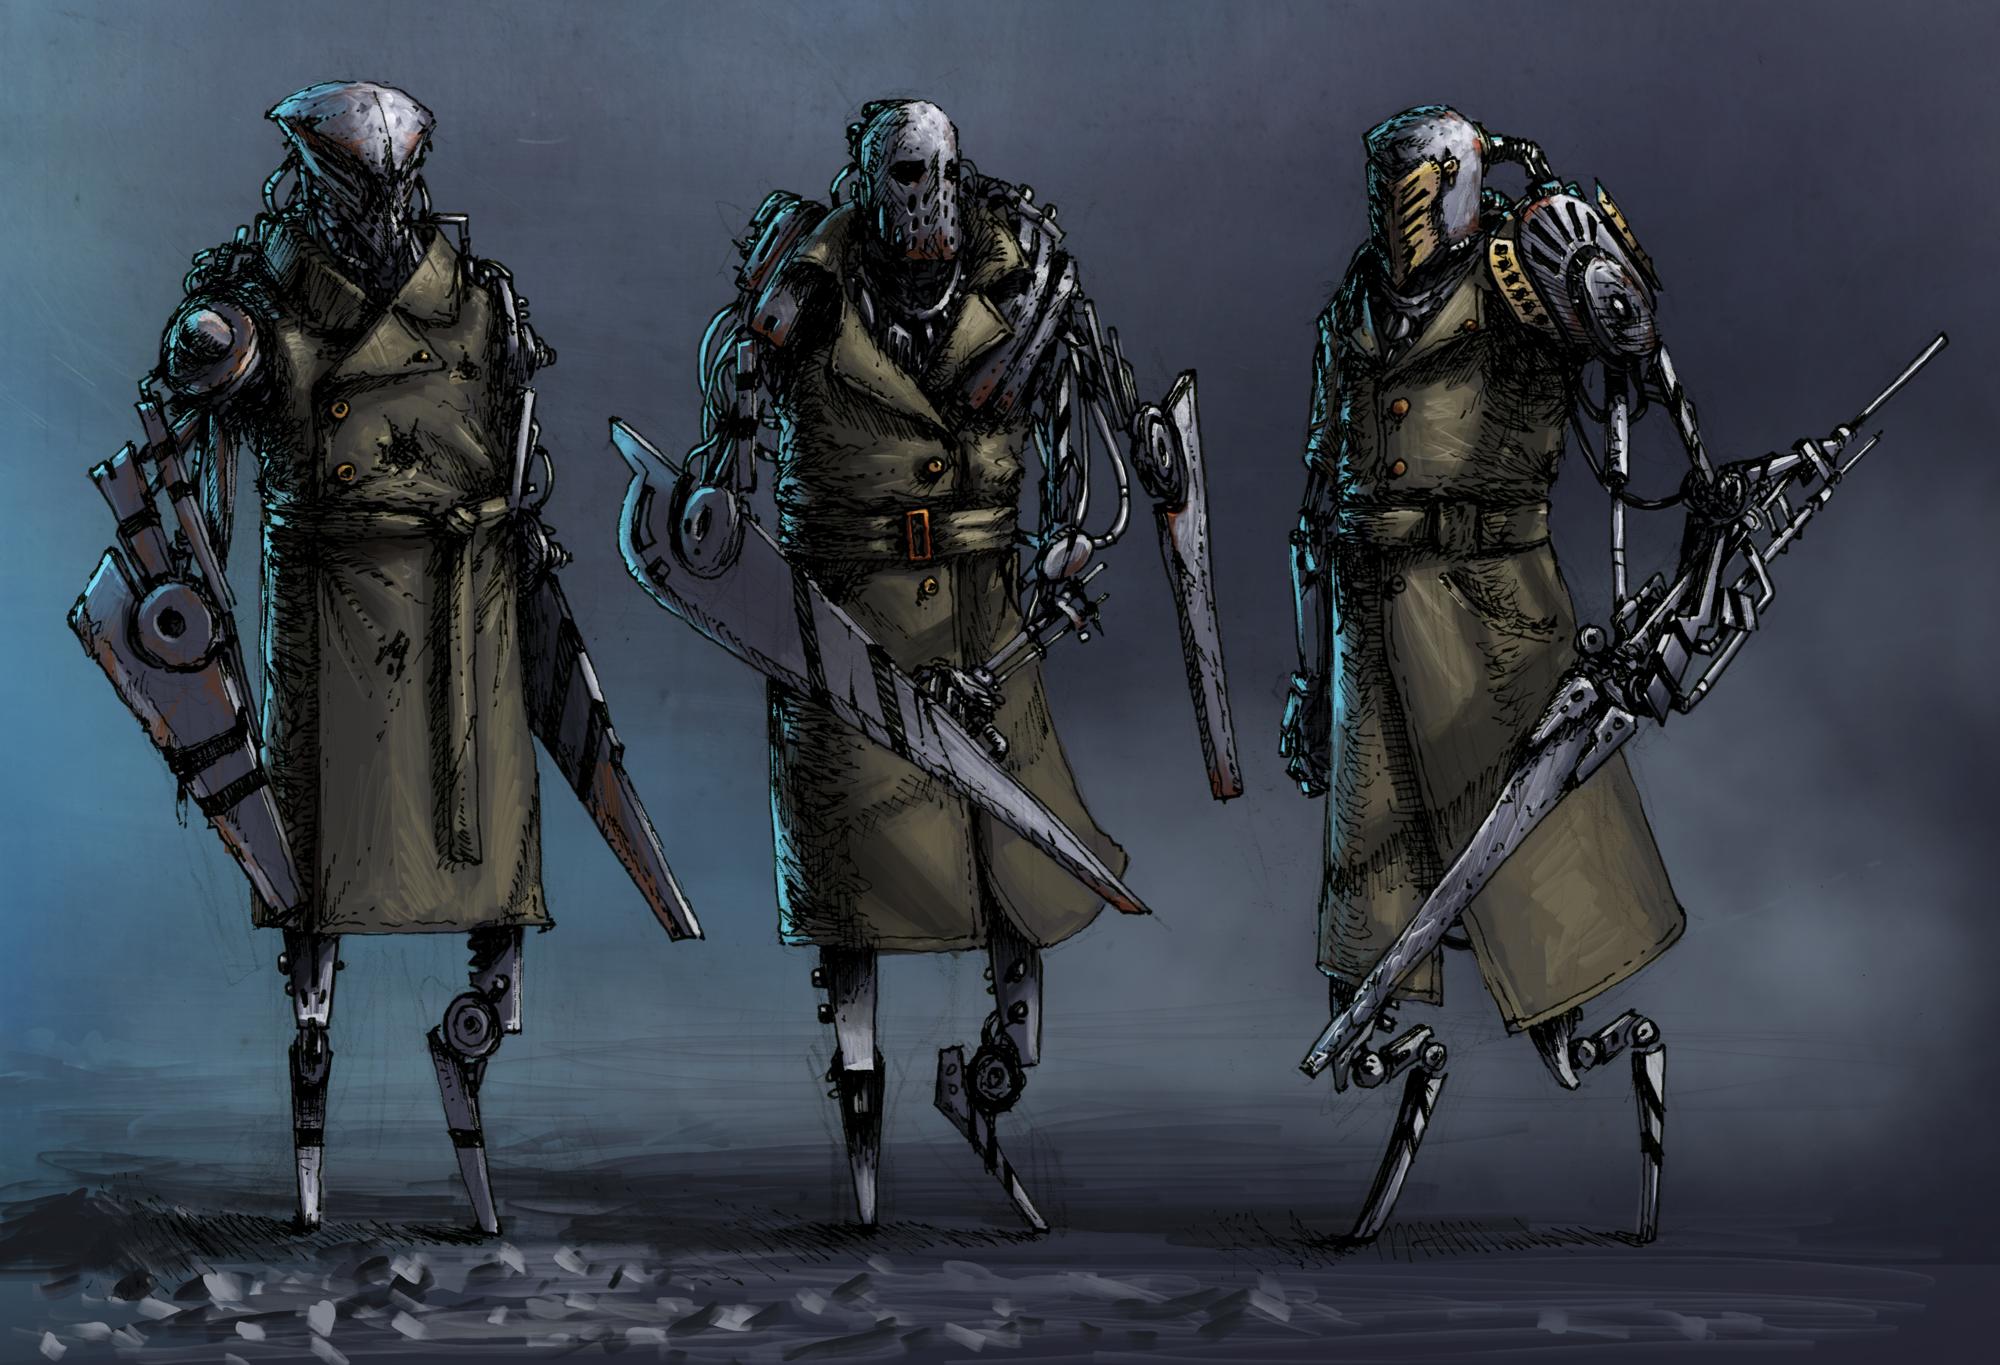 Cyberpunk Designs By Azelinus On Newgrounds